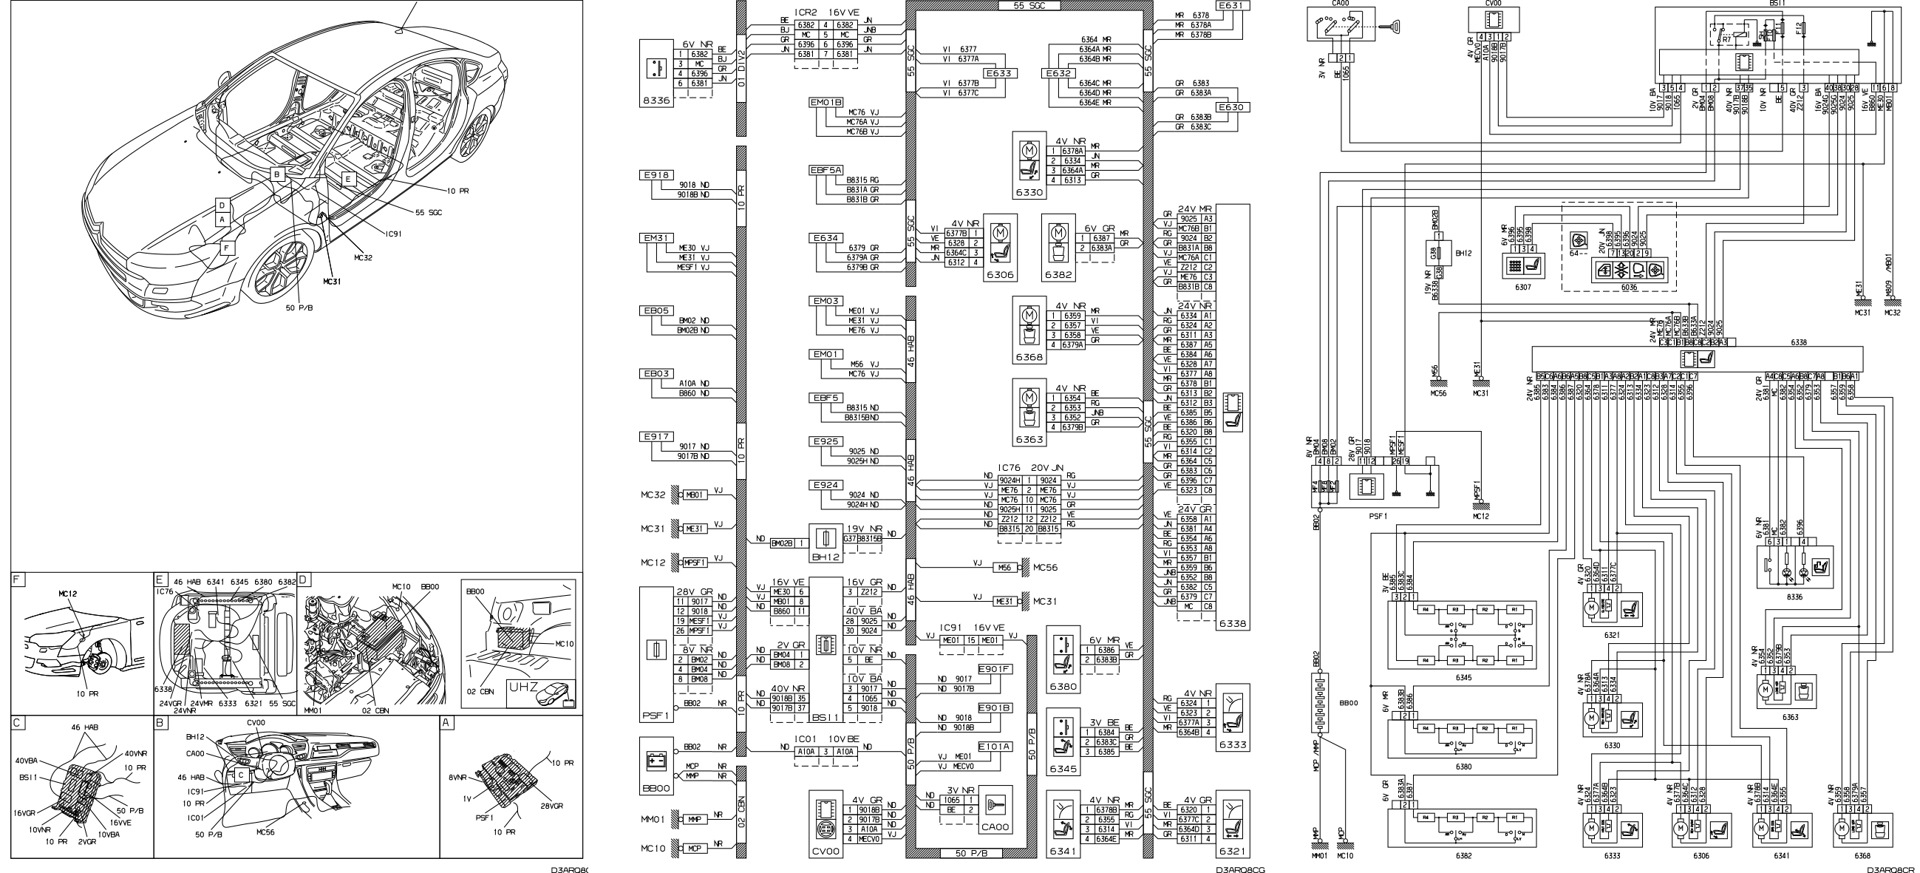 wiring diagram citroen c5 tourer